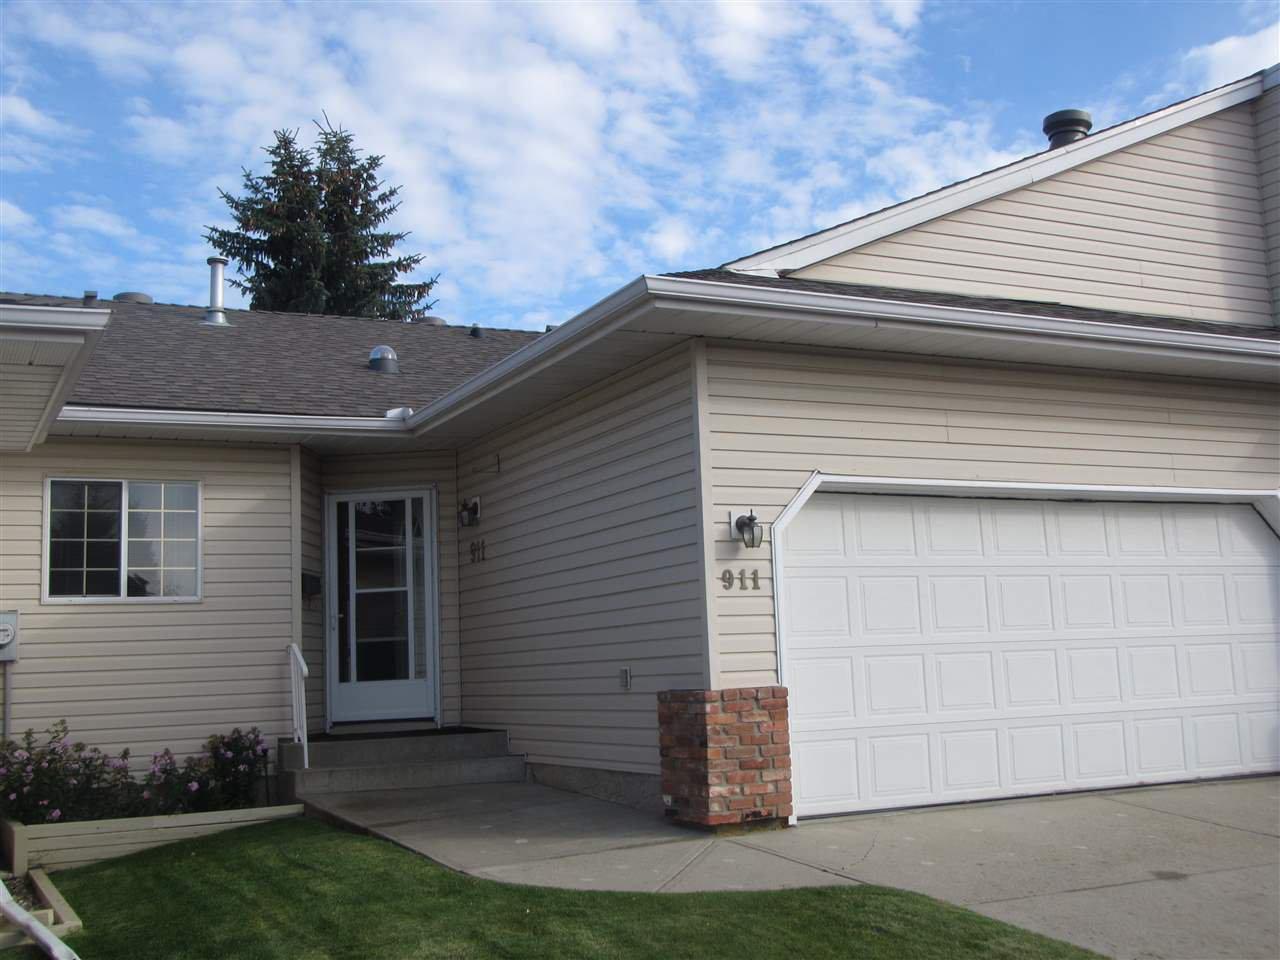 Main Photo: 911 YOUVILLE Drive W in Edmonton: Zone 29 House Half Duplex for sale : MLS®# E4177675